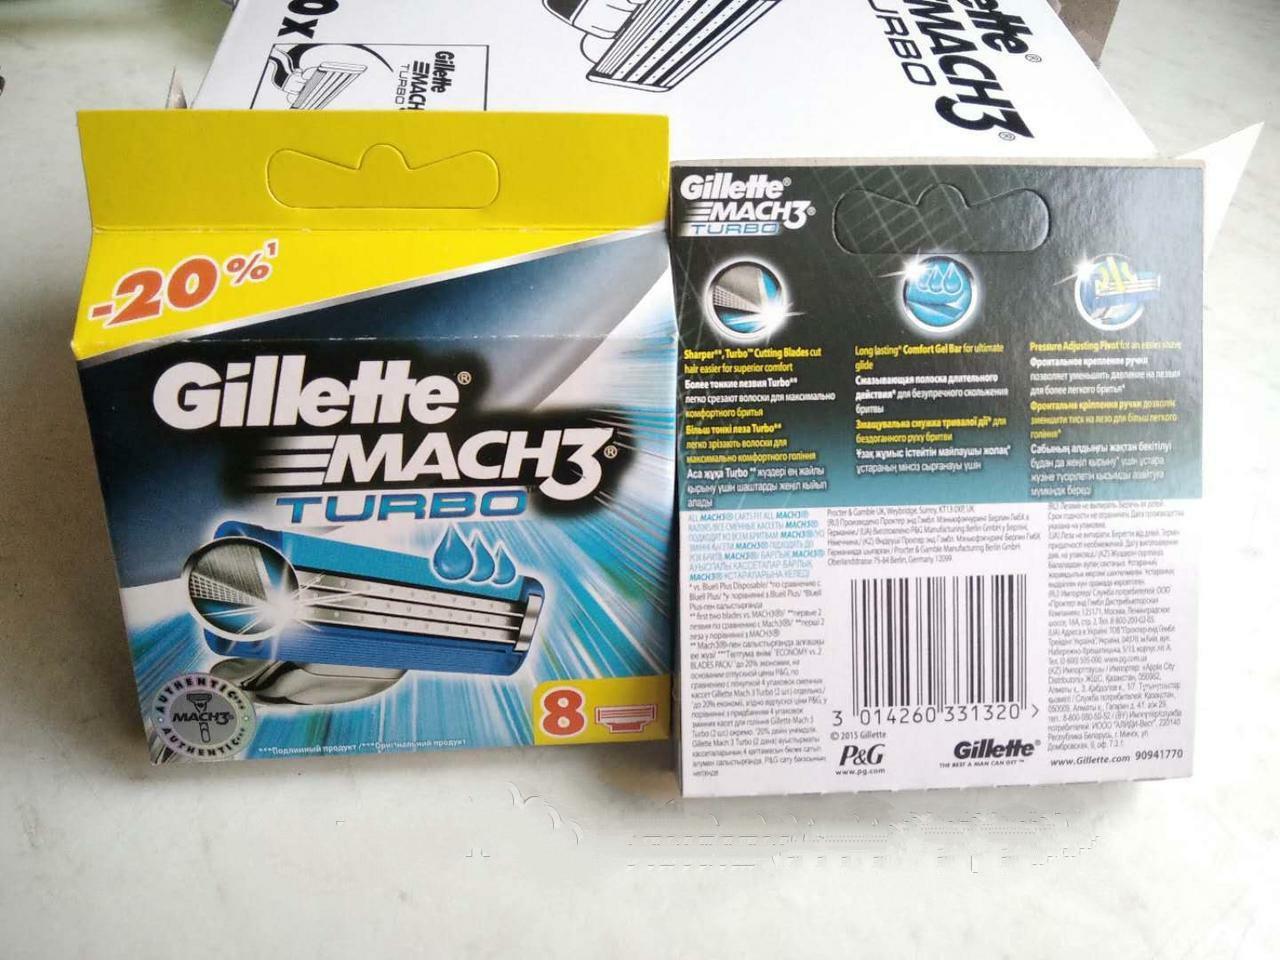 Картриджи, кассеты, лезвия  Gillette Mach 3 Turbo New \ Жилет Мак 3 Турбо 8 шт